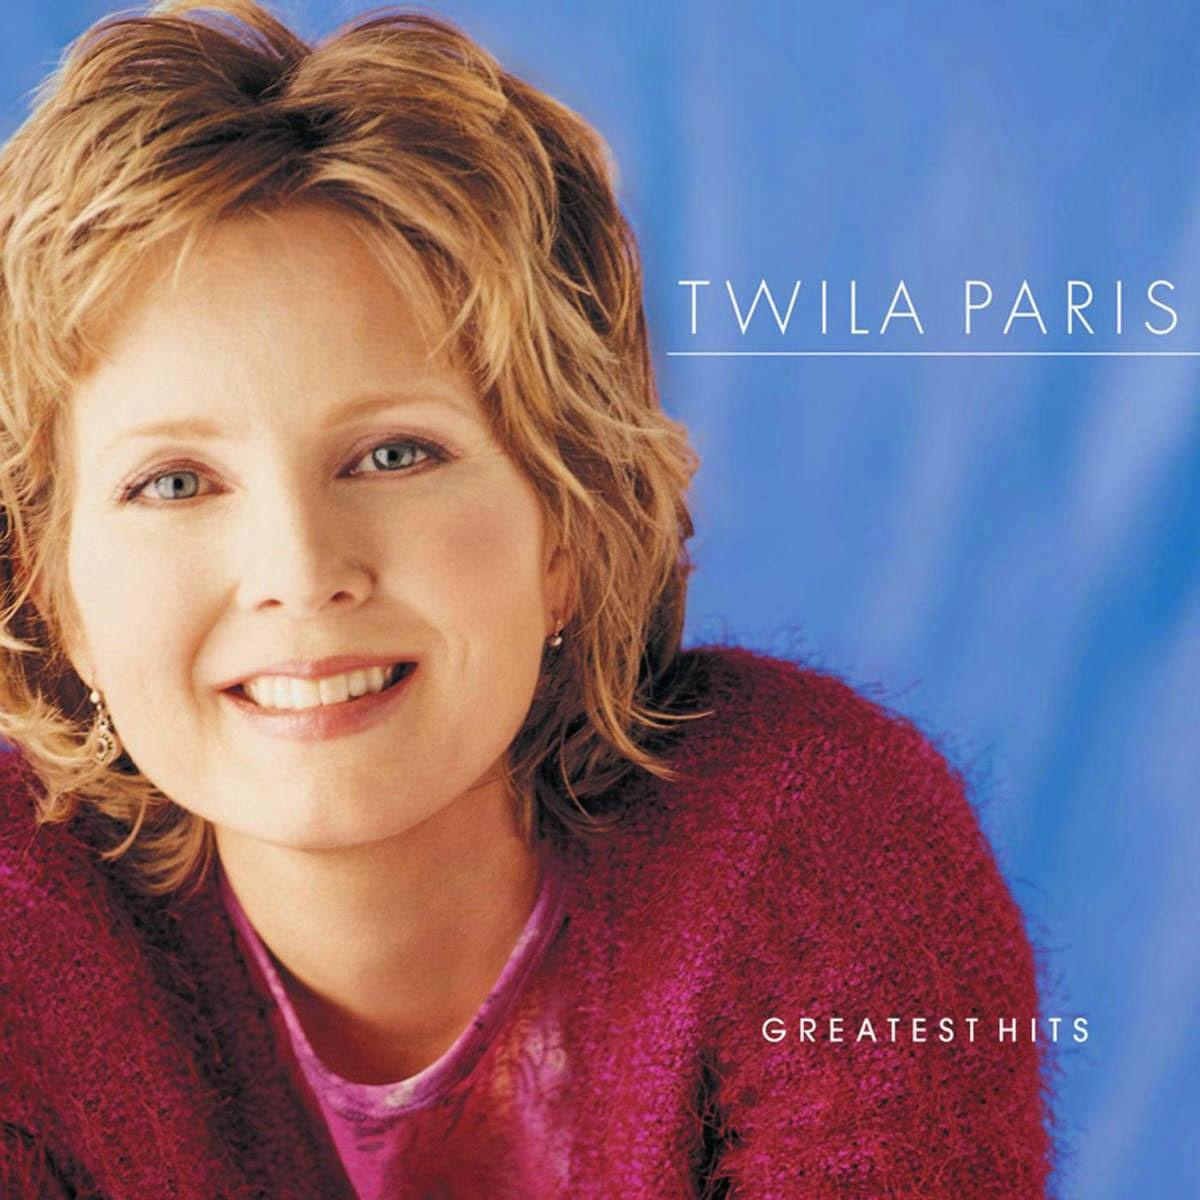 Twila Paris-Greatest Hits-2001-